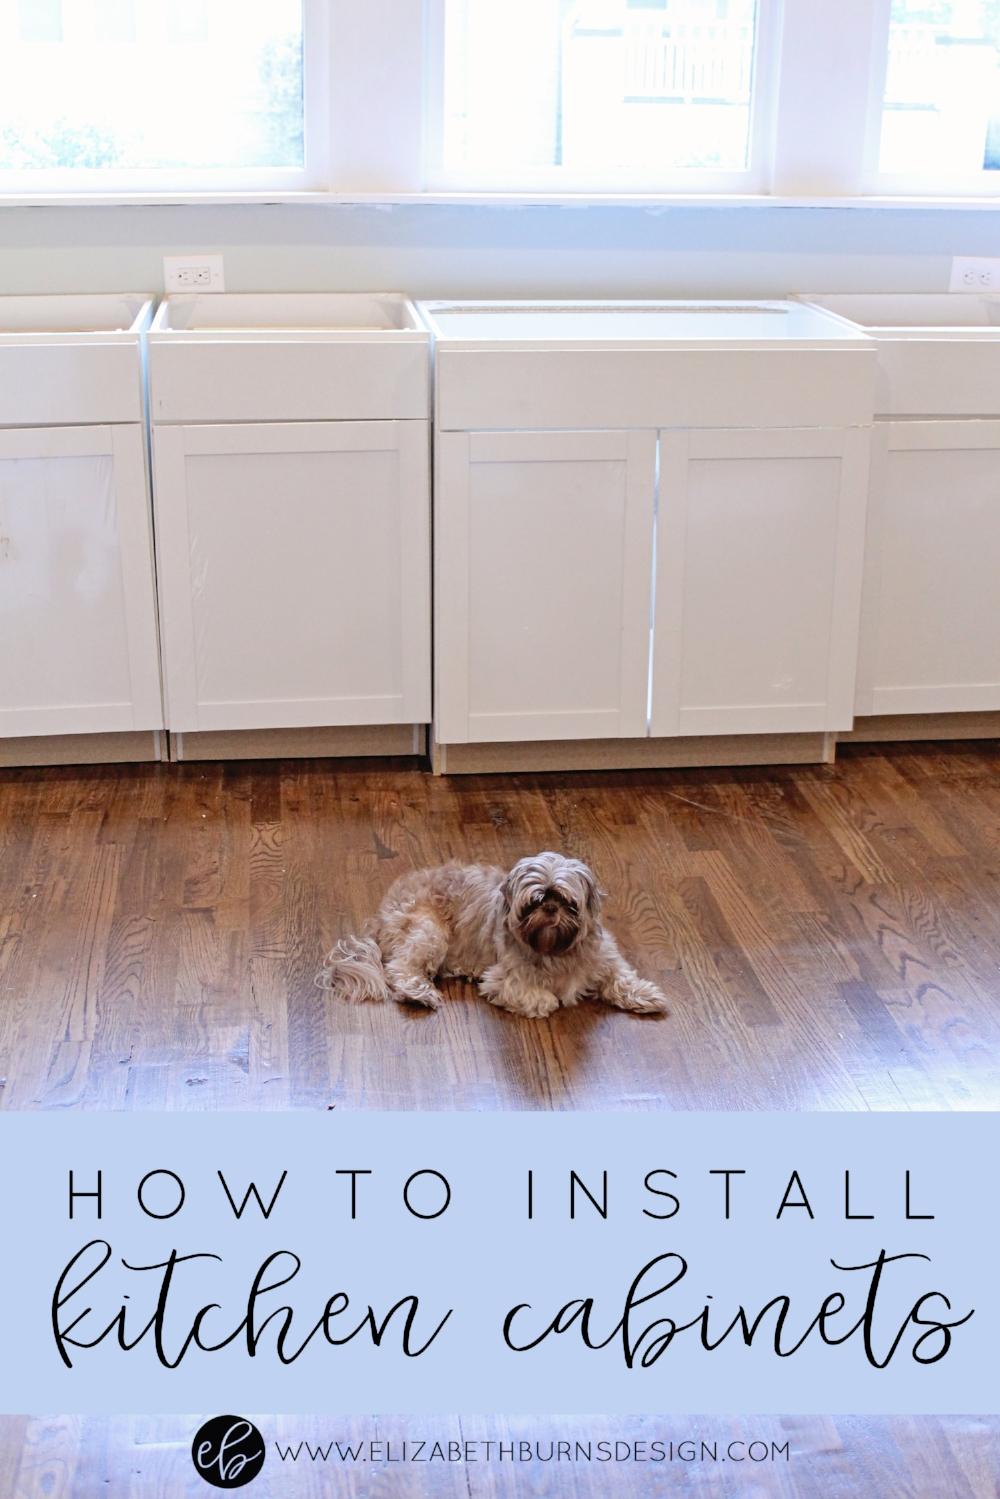 Installing Kitchen Cabinets main.jpg